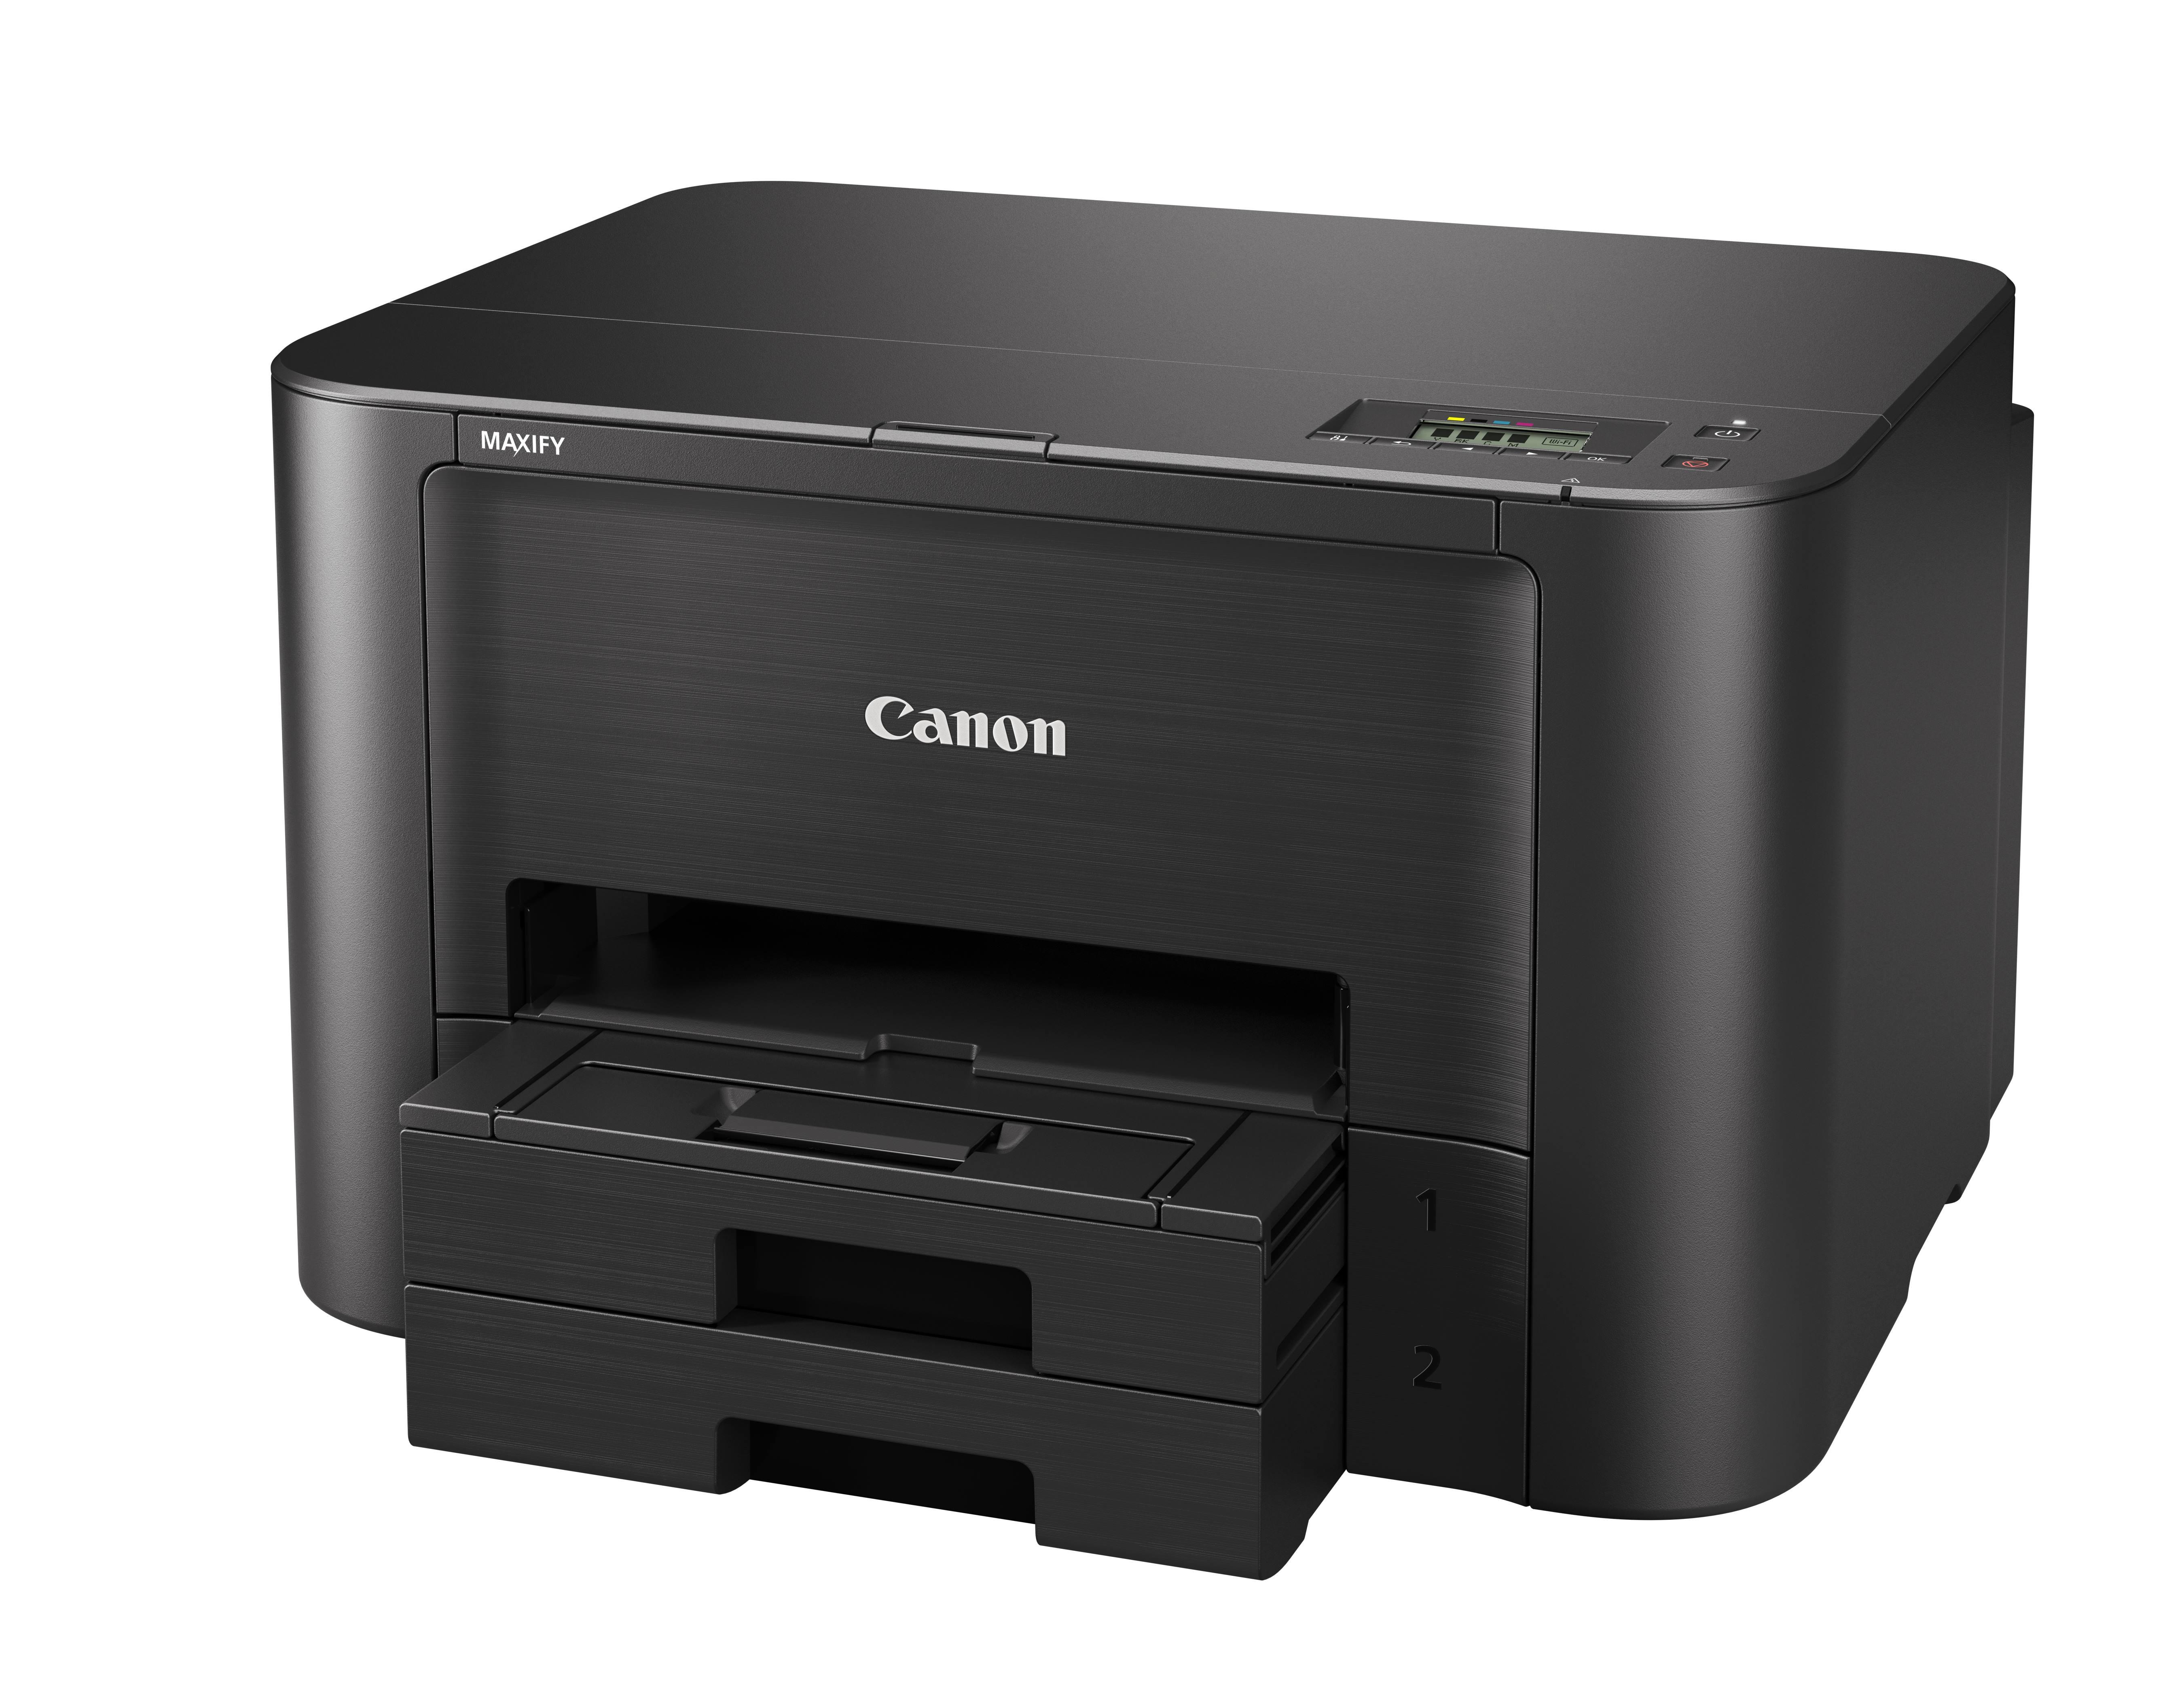 Canon Maxify iB4140 (0972C007) принтер струйный